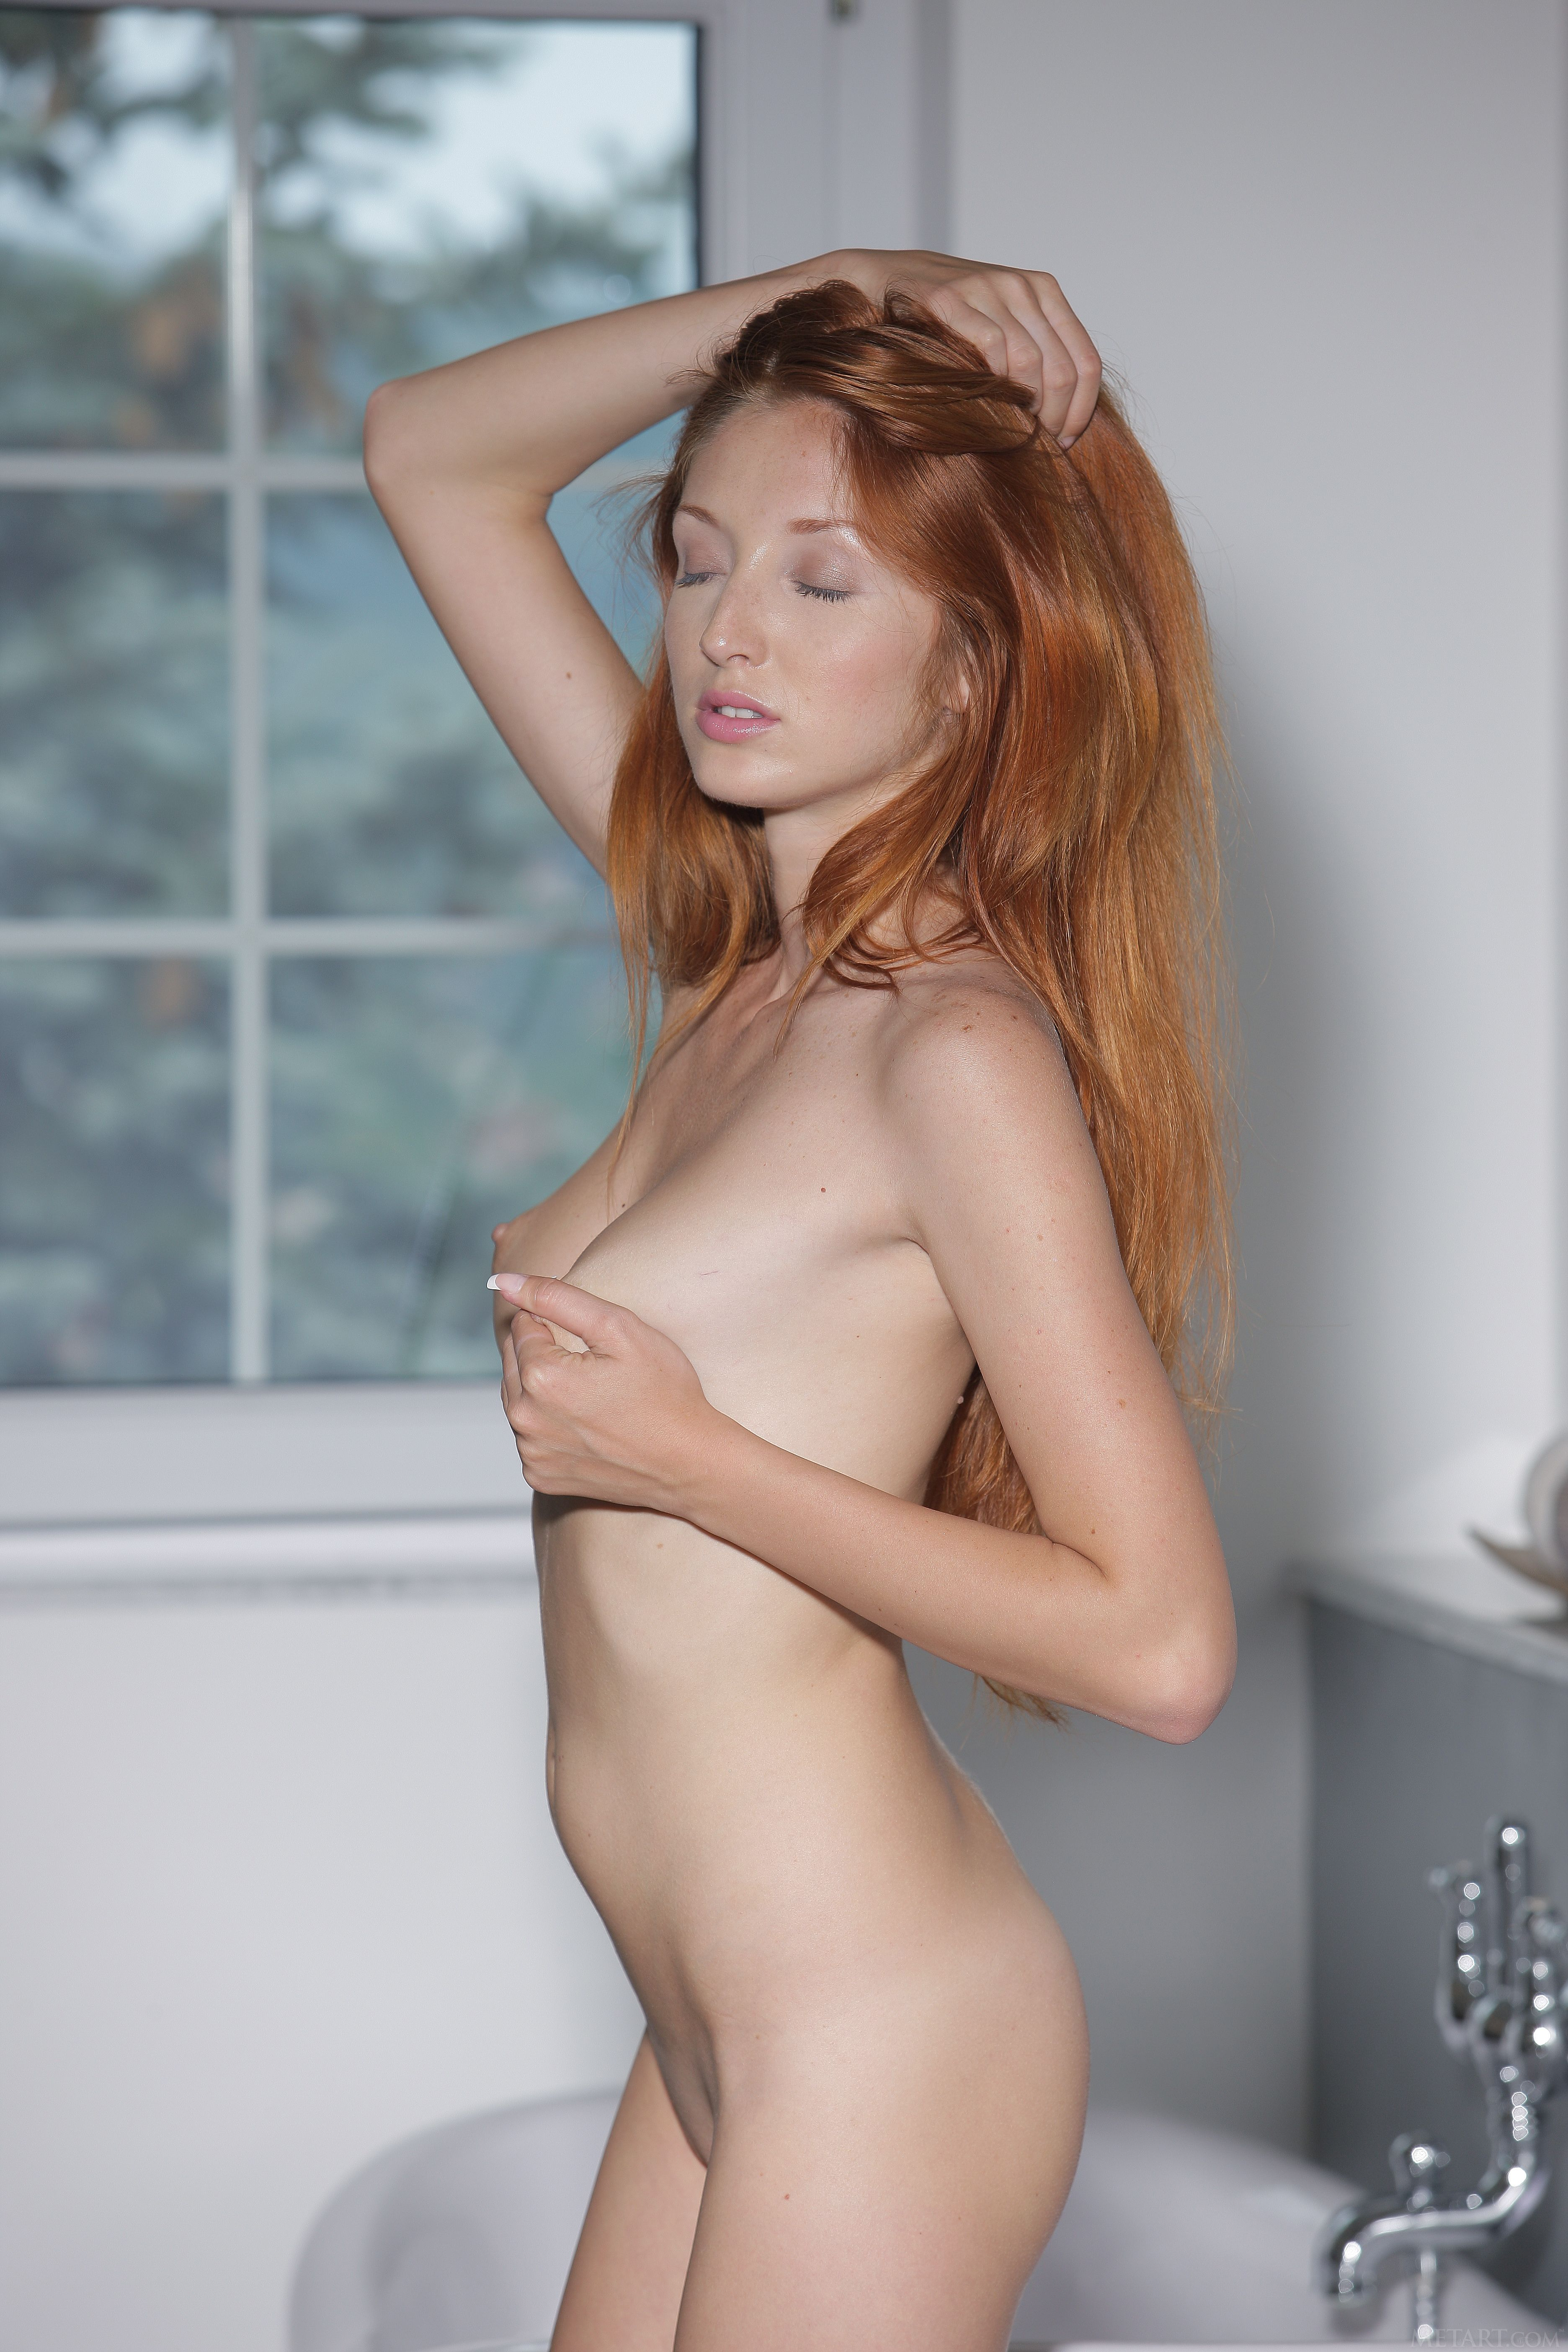 B porn Michelle